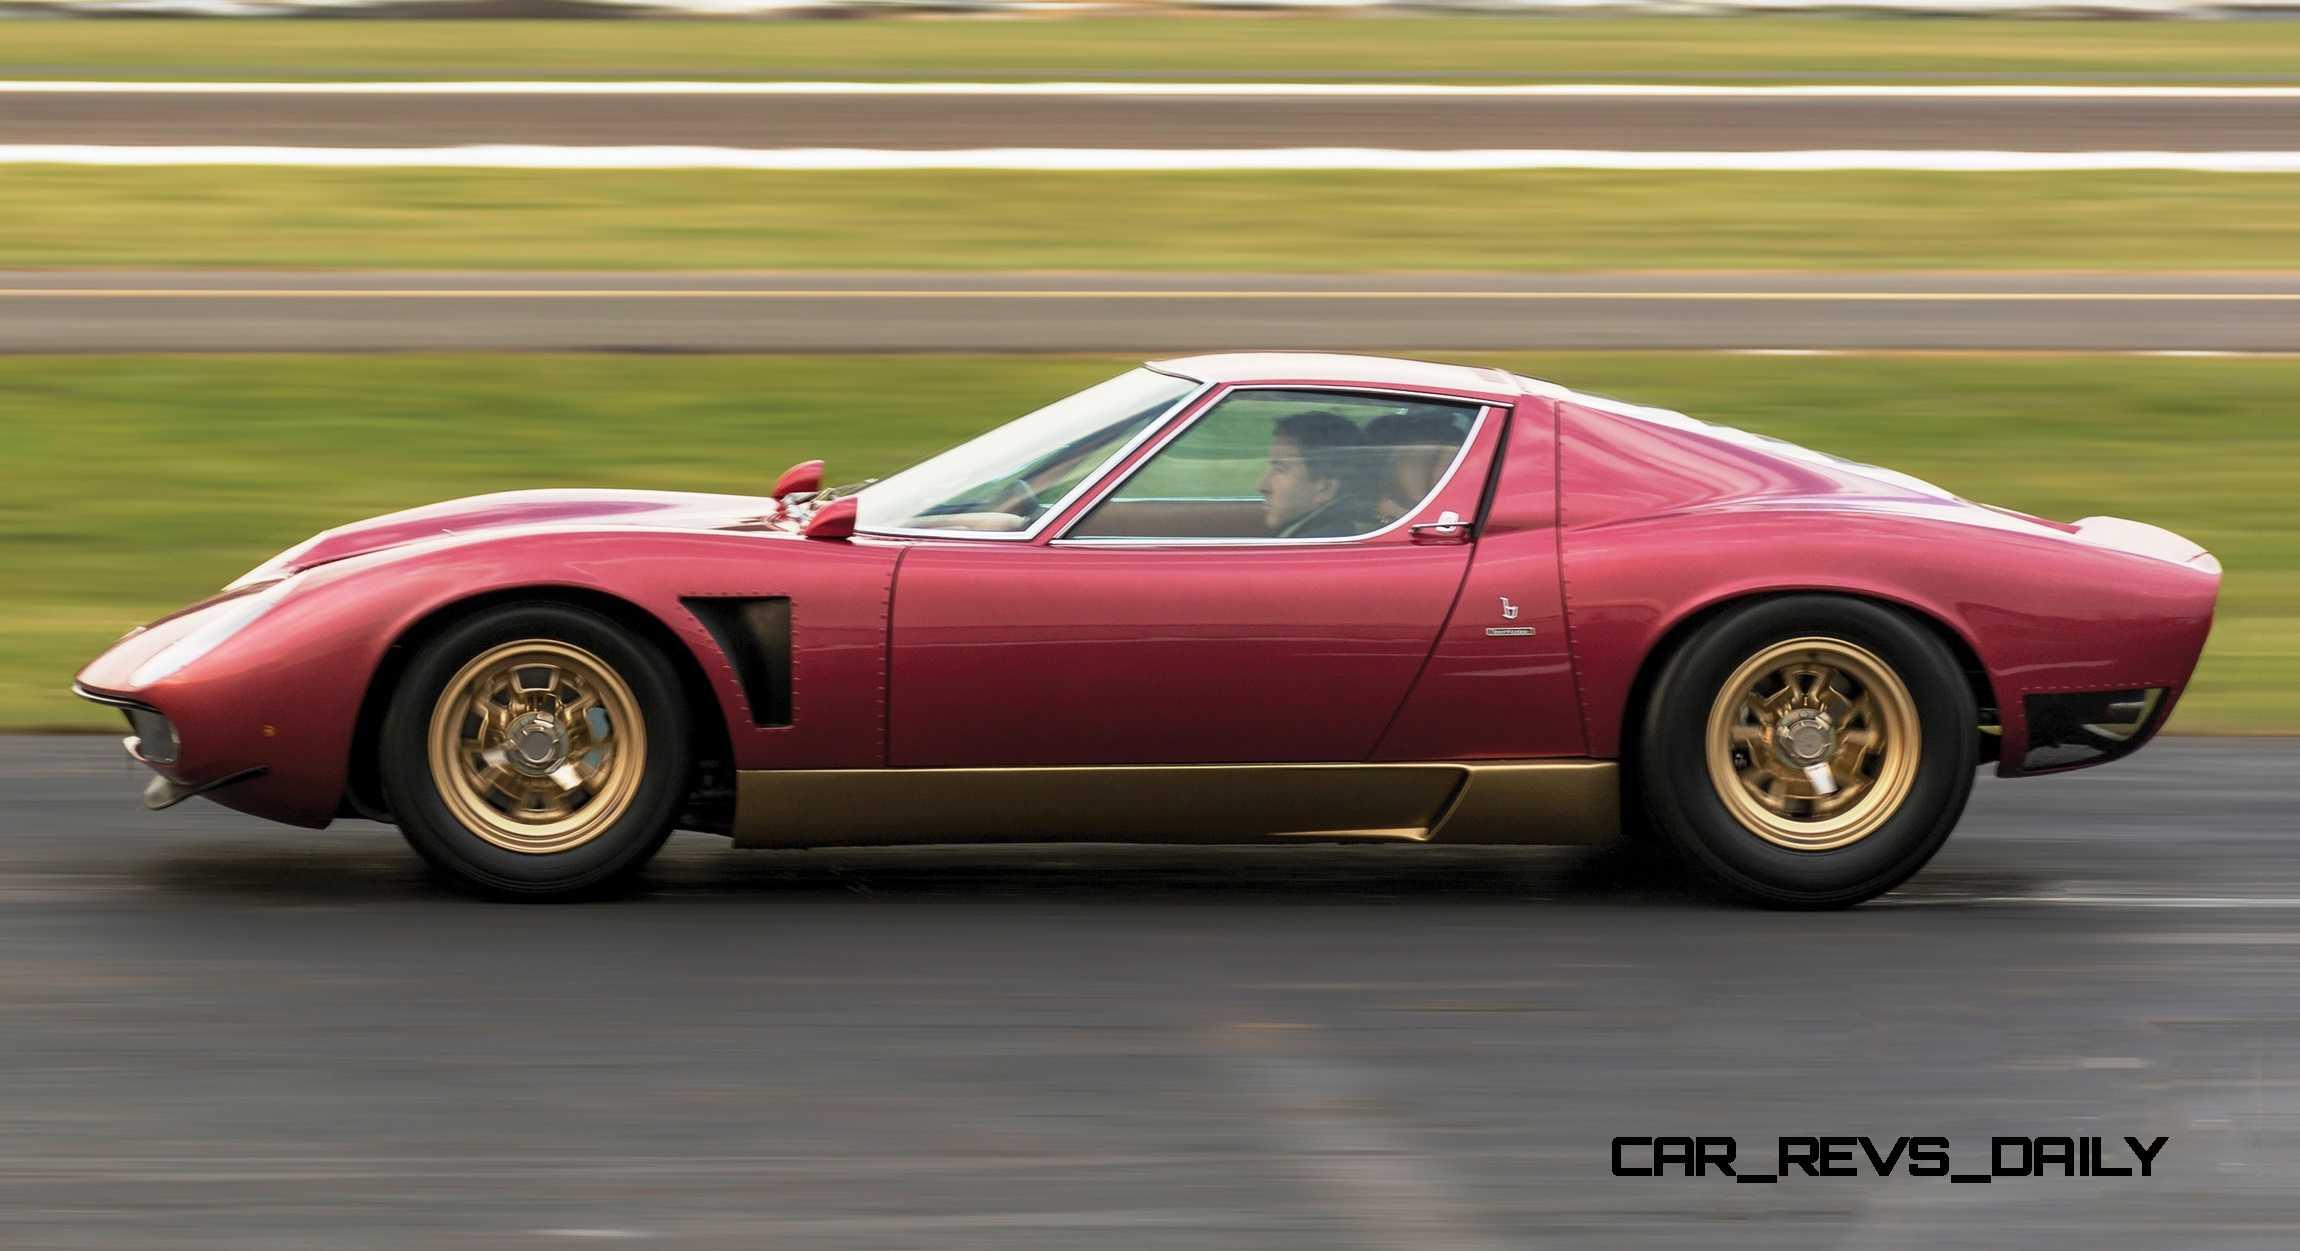 http://www.car-revs-daily.com/wp-content/uploads/2014/12/1971-Lamborghini-Miura-SV-Jota-30.jpg